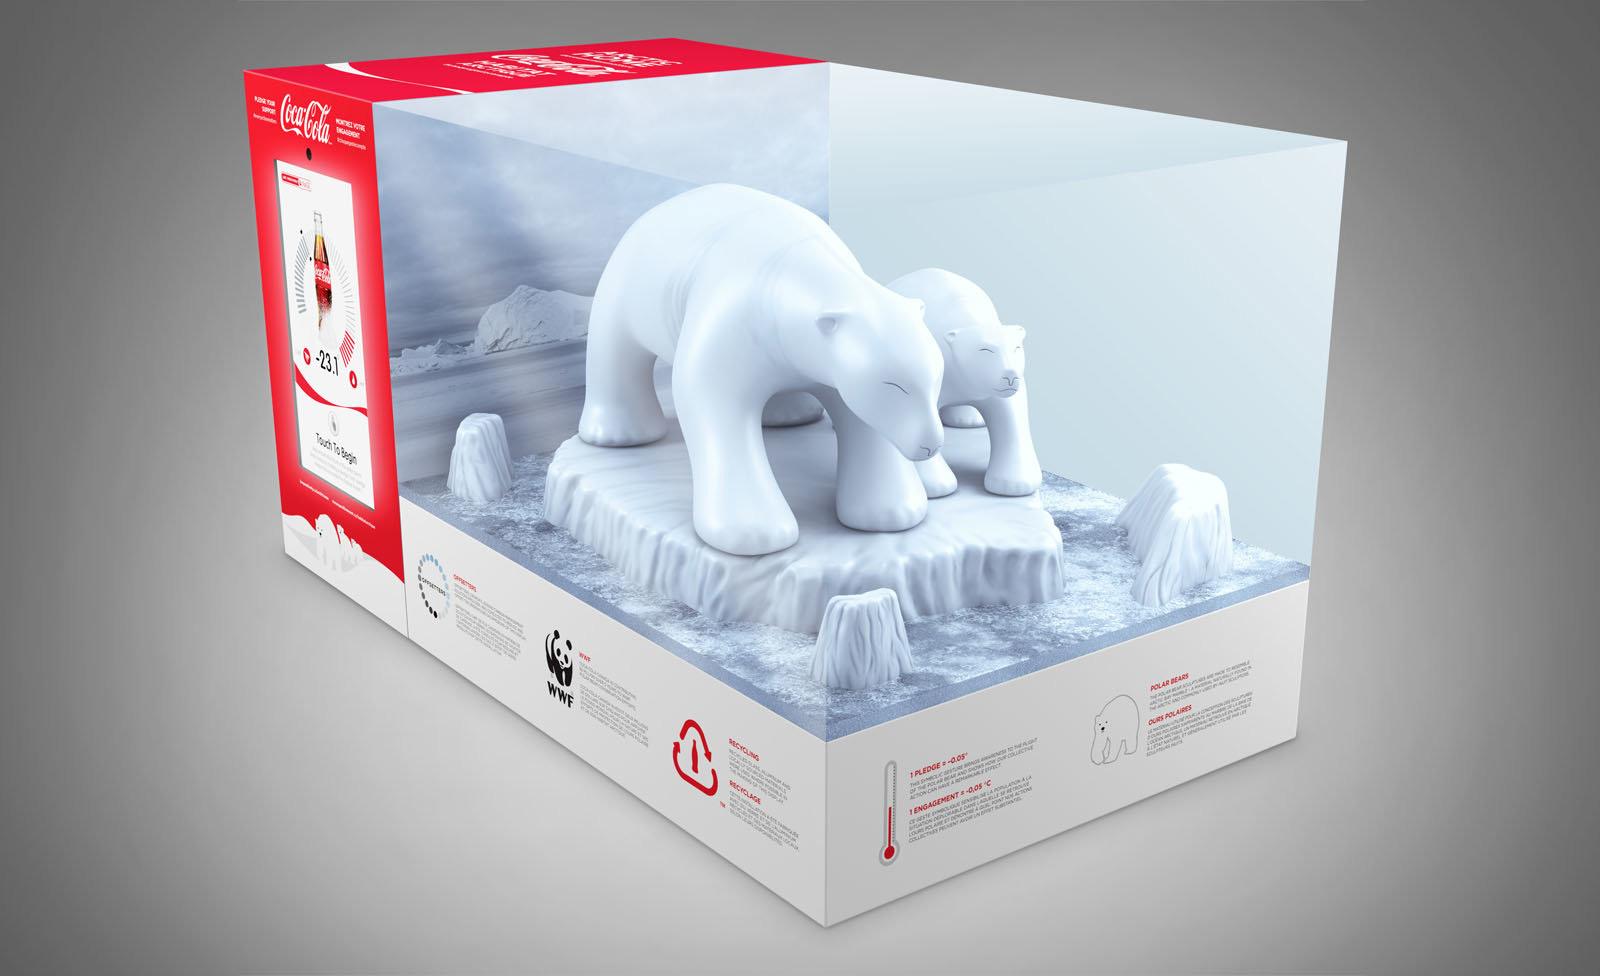 Coke Arctic Home